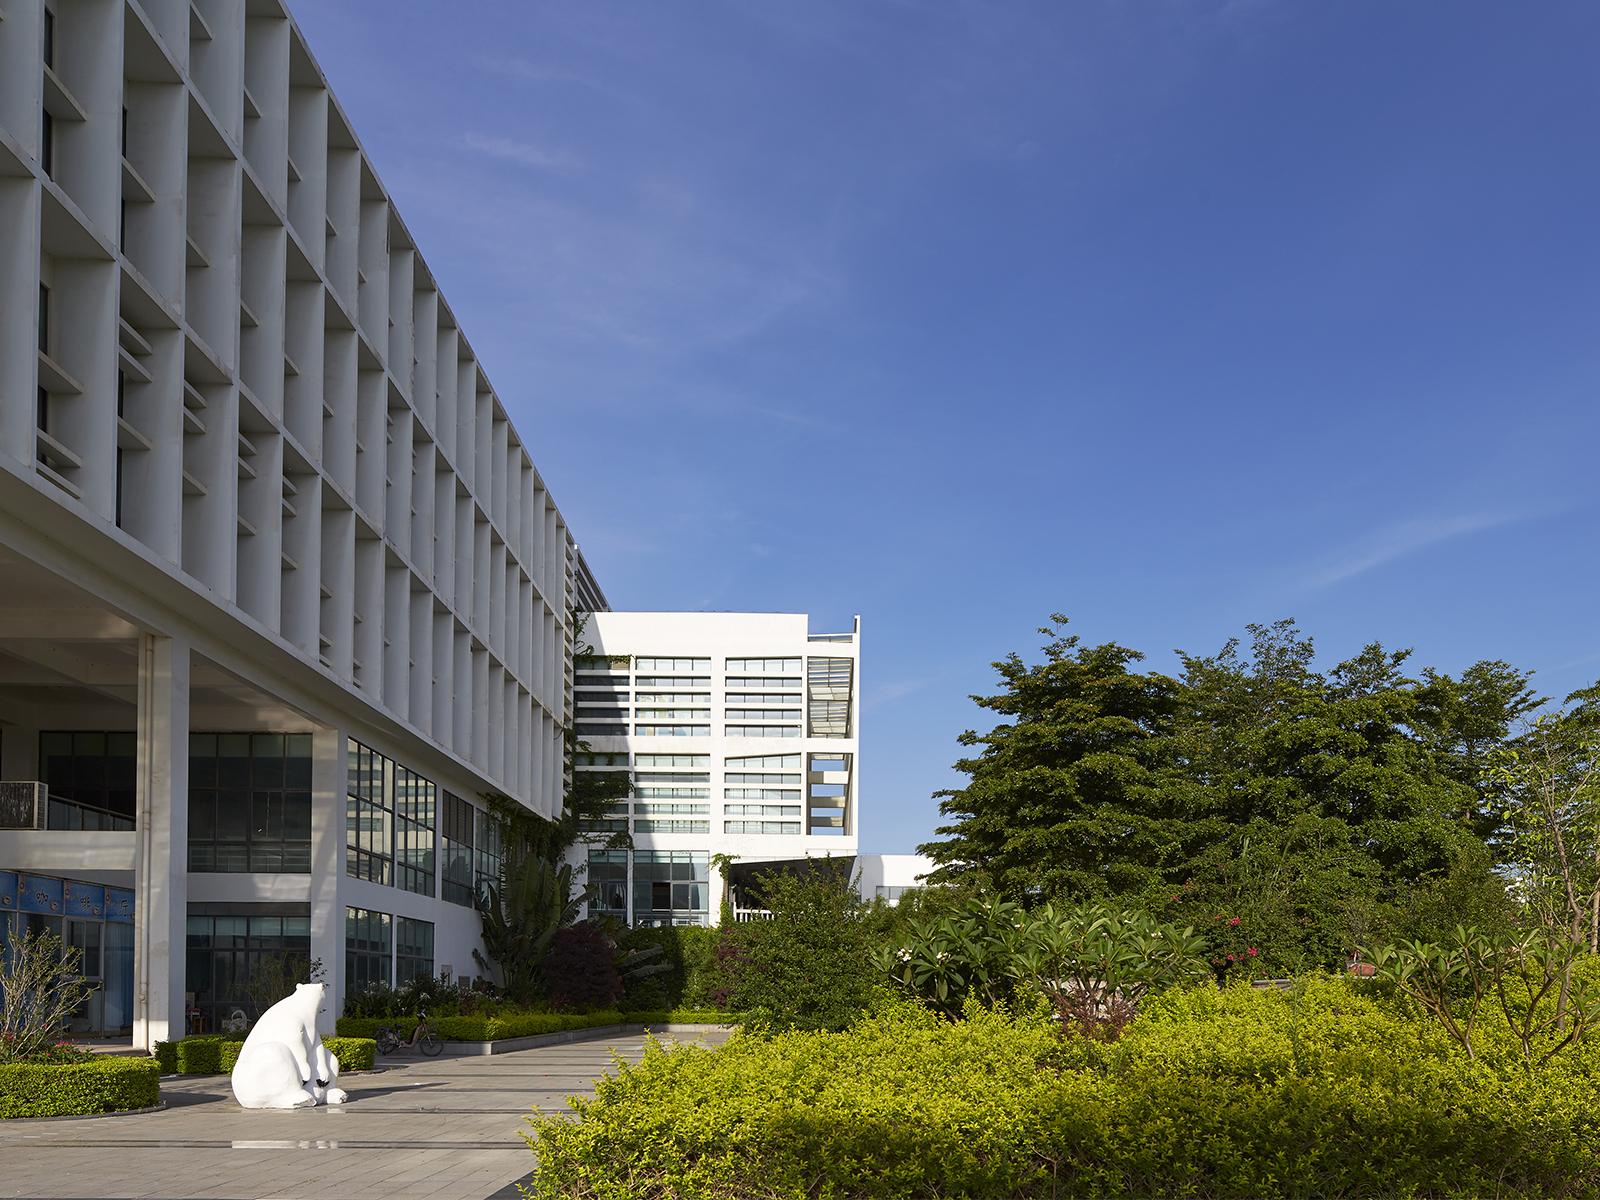 厦门南洋学院_Xiamen Nanyang College_Right_02.jpg